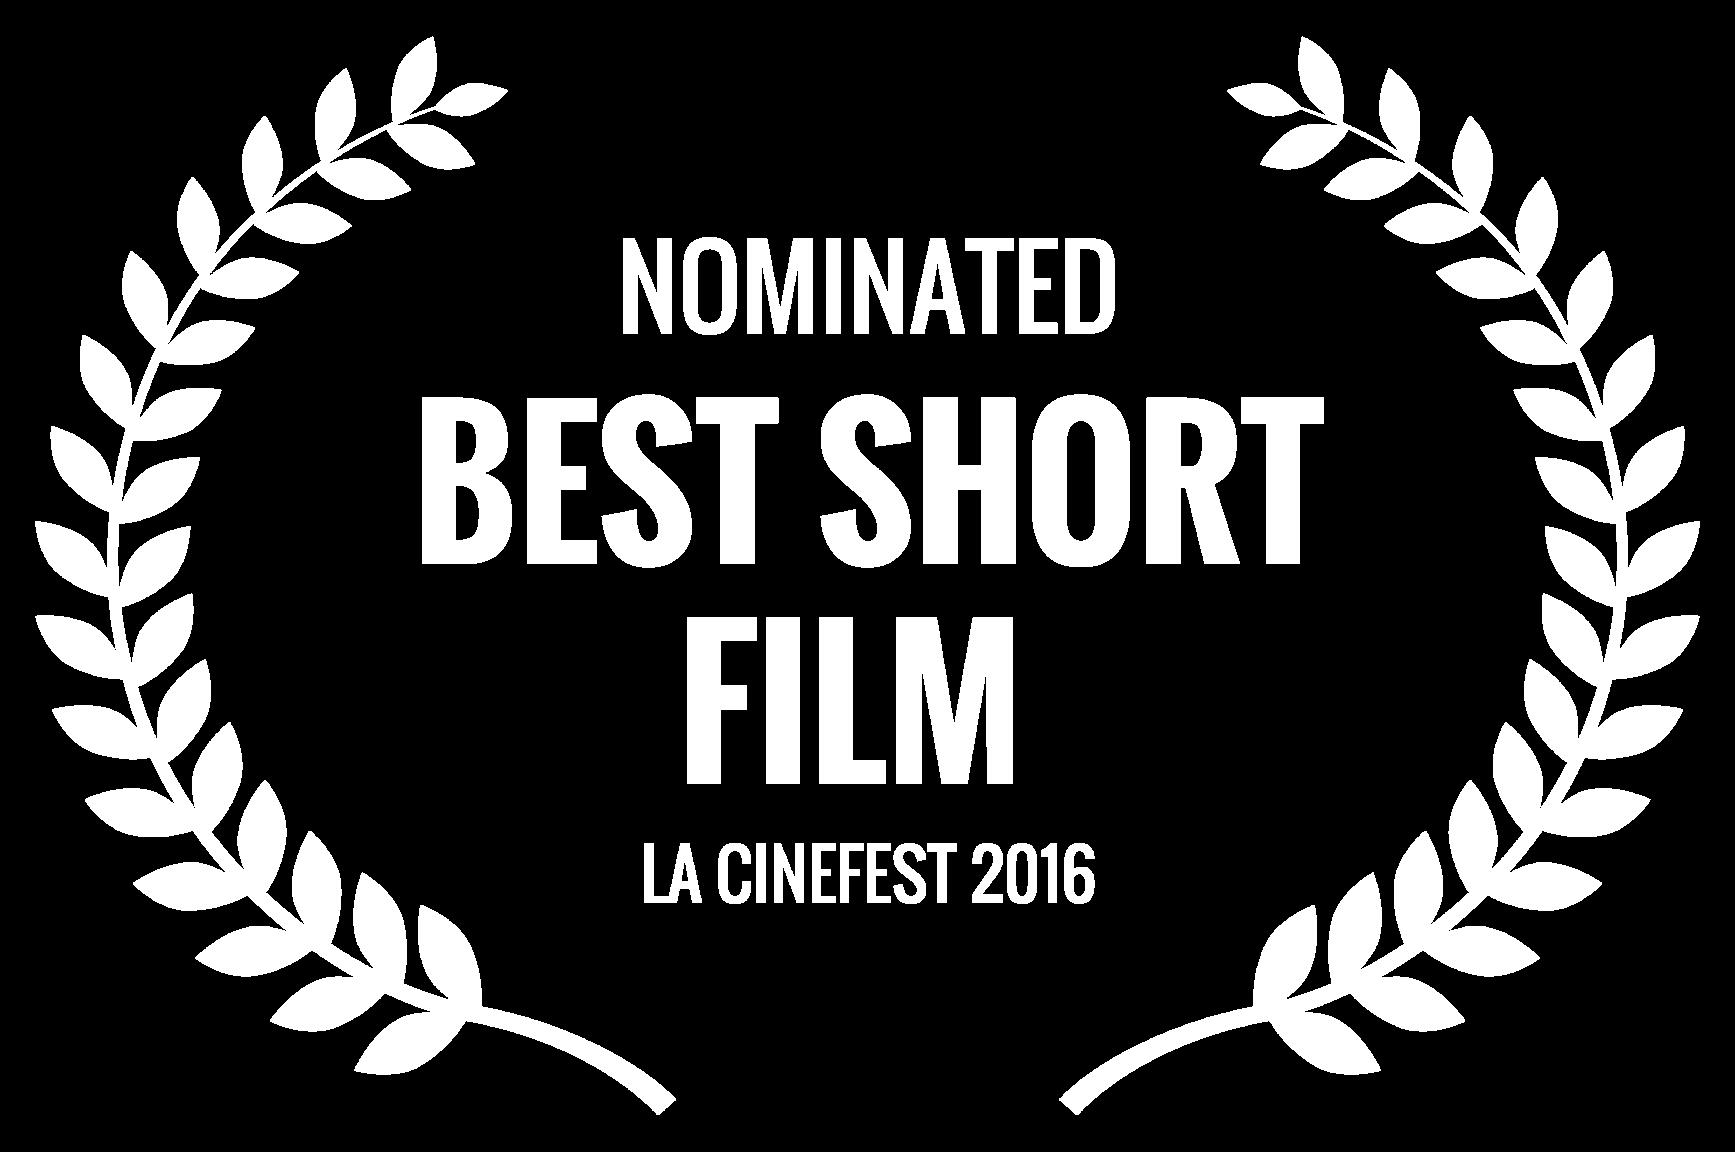 NOMINATED - BEST SHORT FILM  - LA CINEFEST 2016 (1).png